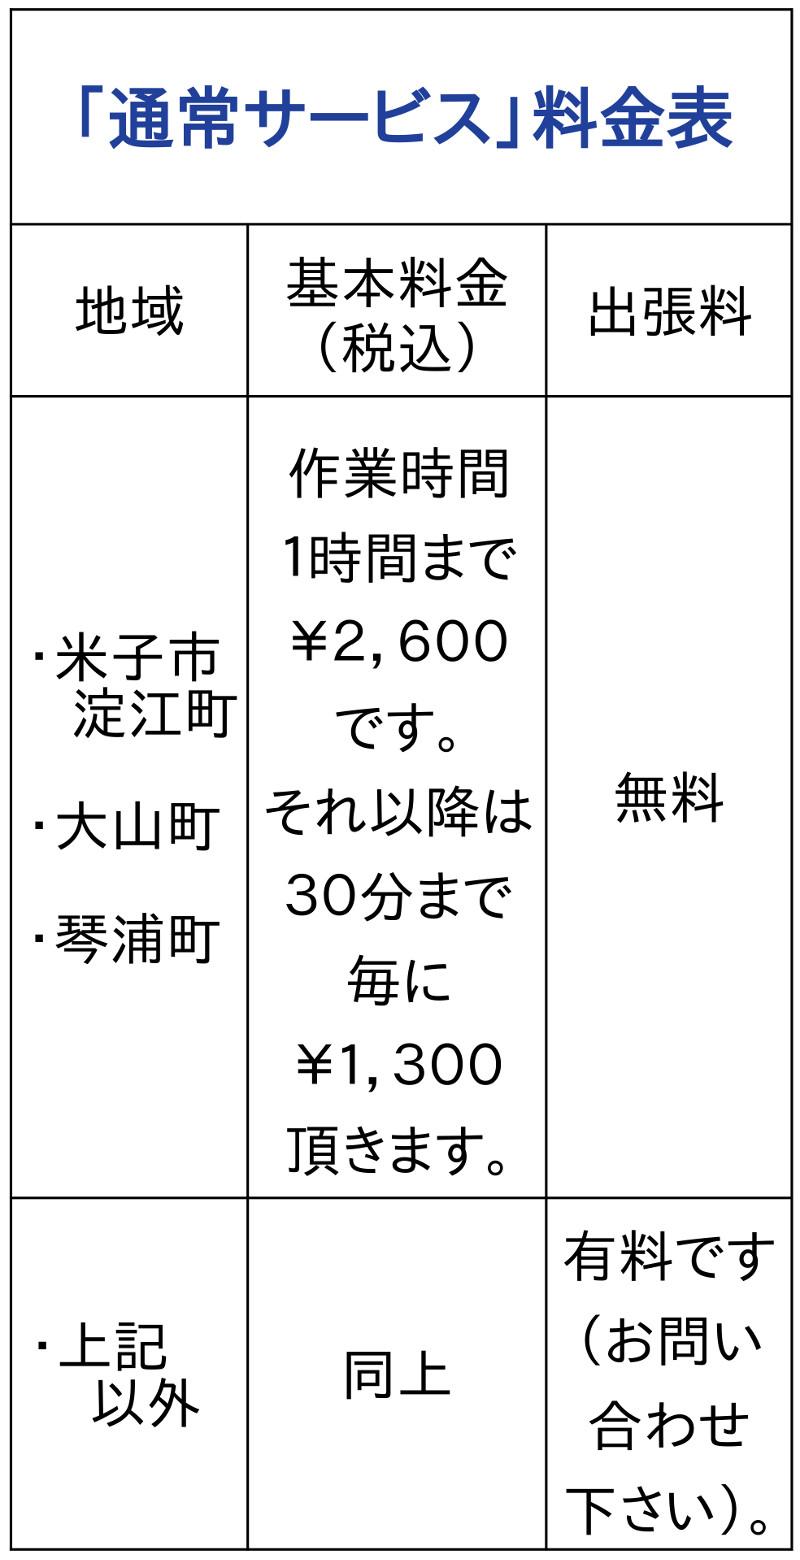 goope通常サービス料金表.jpg